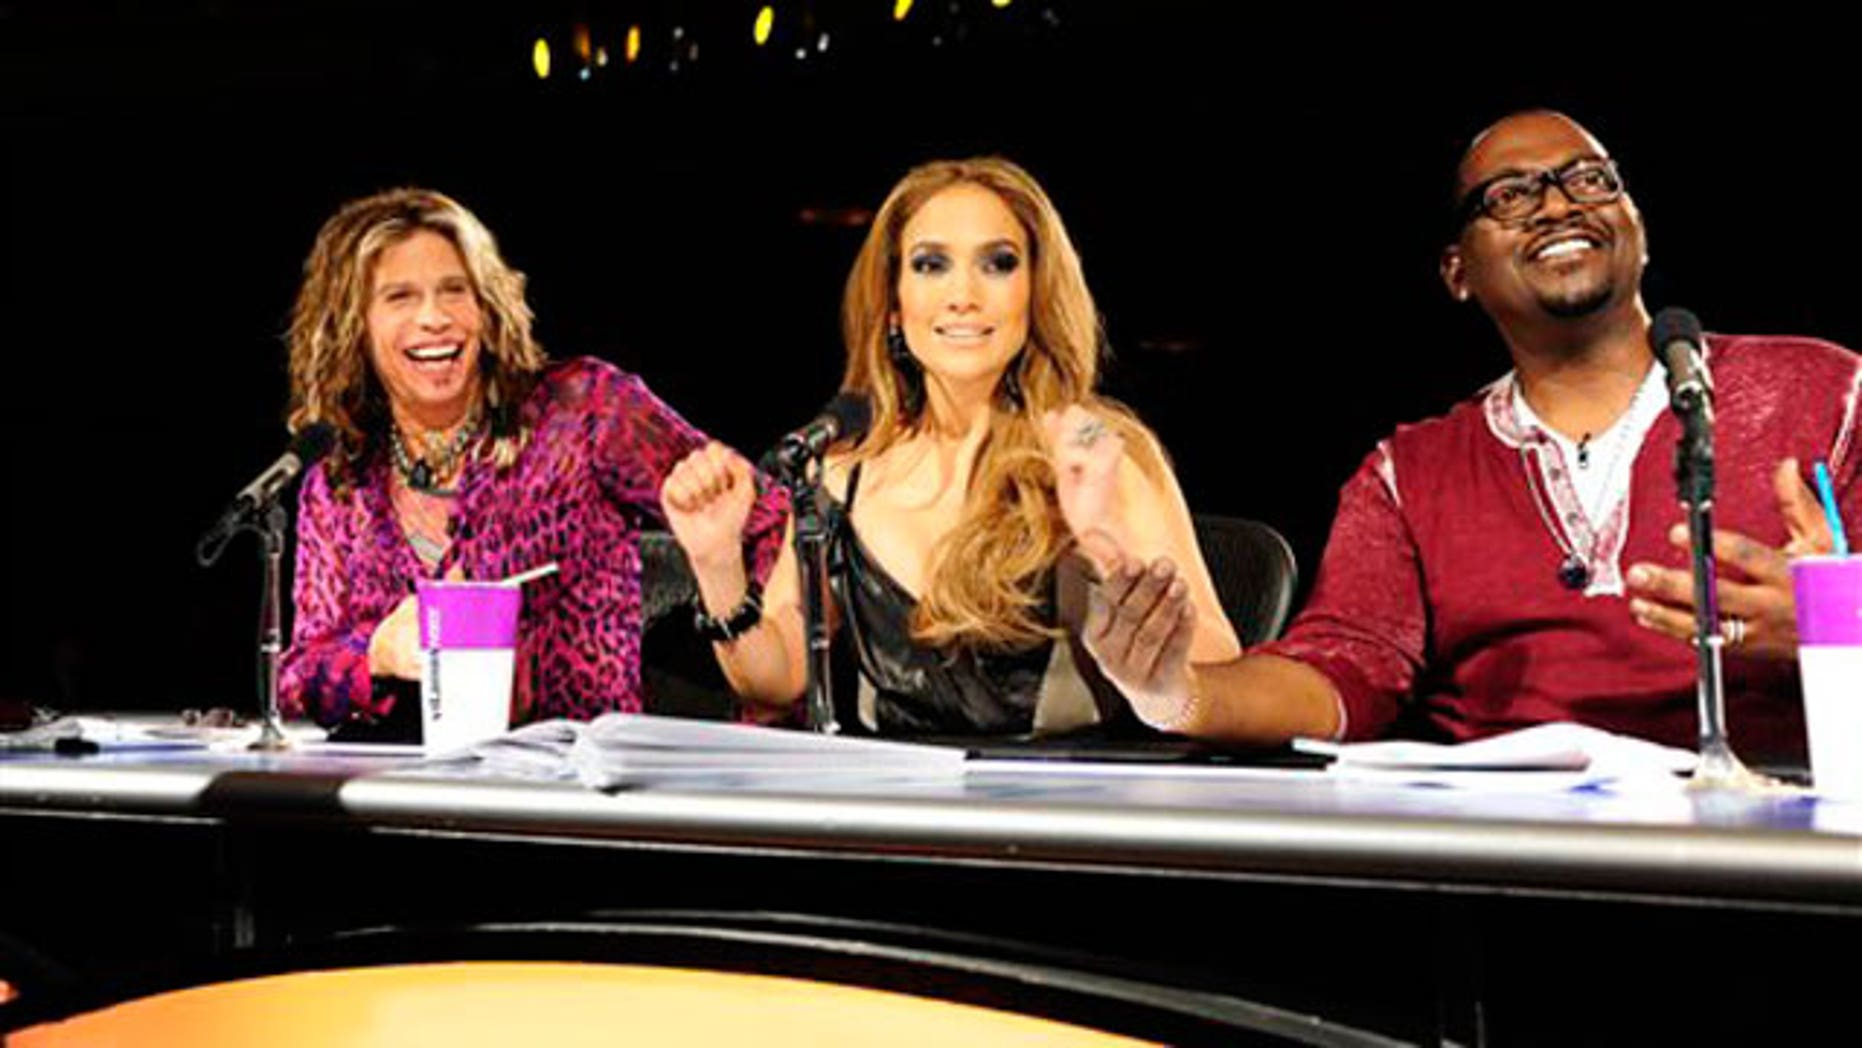 """American Idol"" judges Steven Tyler, Jennifer Lopez and Randy Jackson. (AP)"